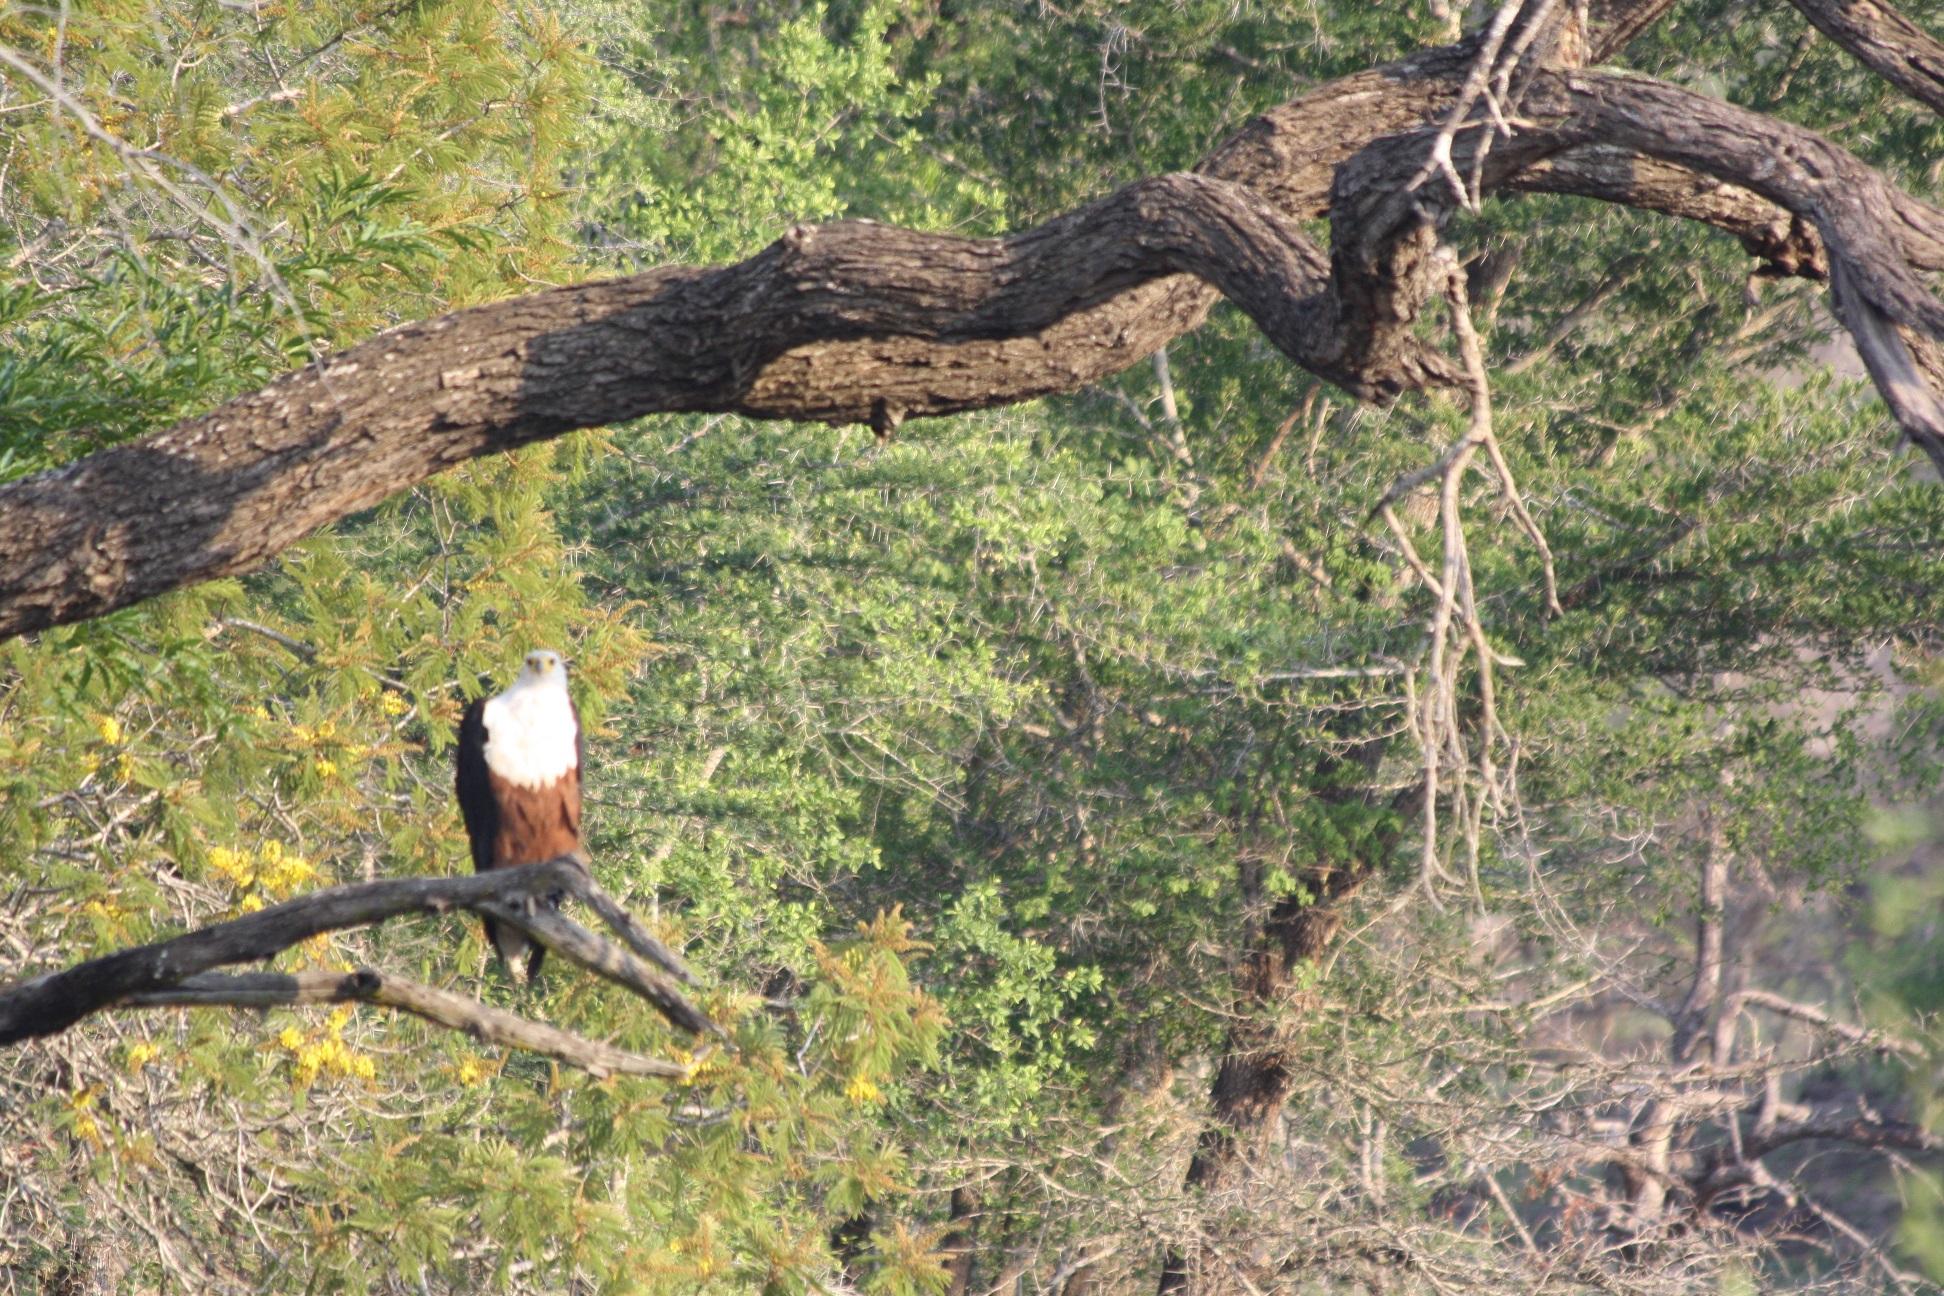 The majestic Fish Eagle